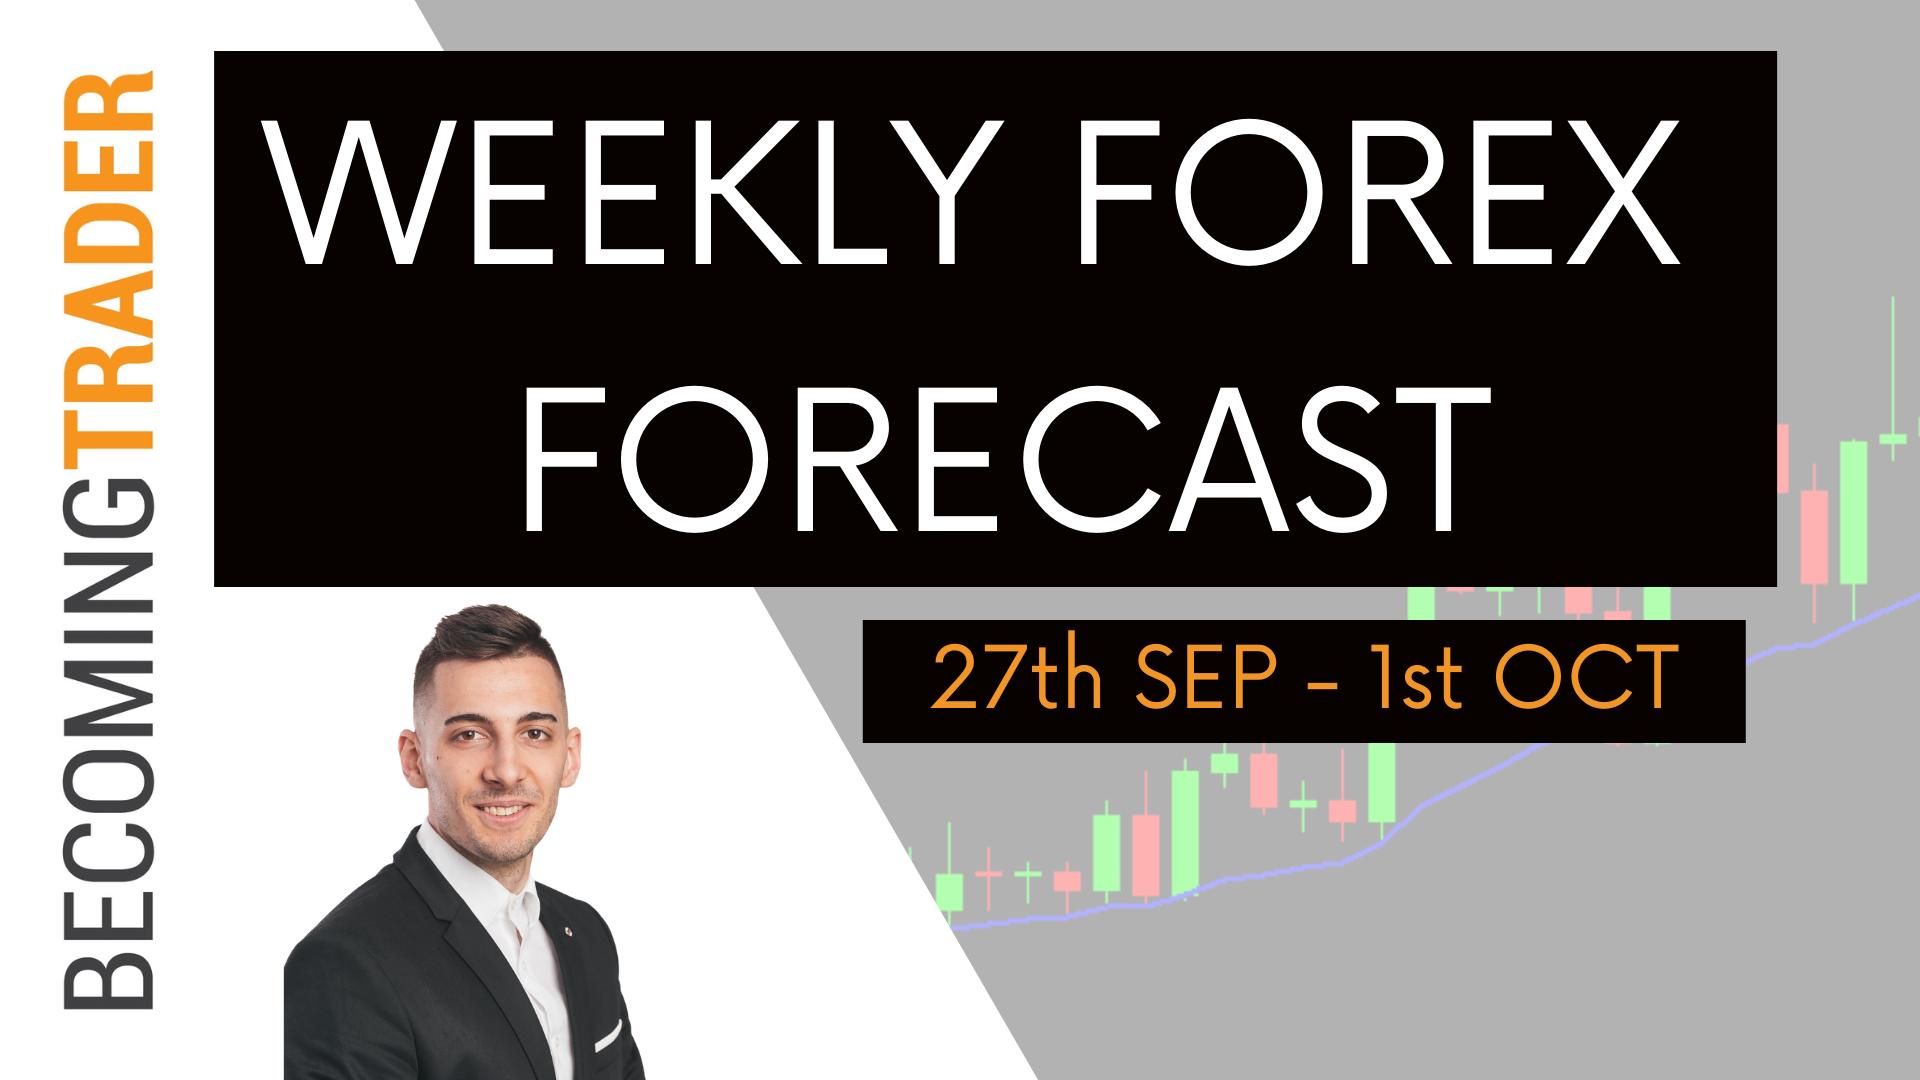 Weekly Forex Forecast 27th Sep to 1st Oct 2021 | EURUSD , GBPUSD , AUDUSD , NZDUSD , USDCAD , USDJPY